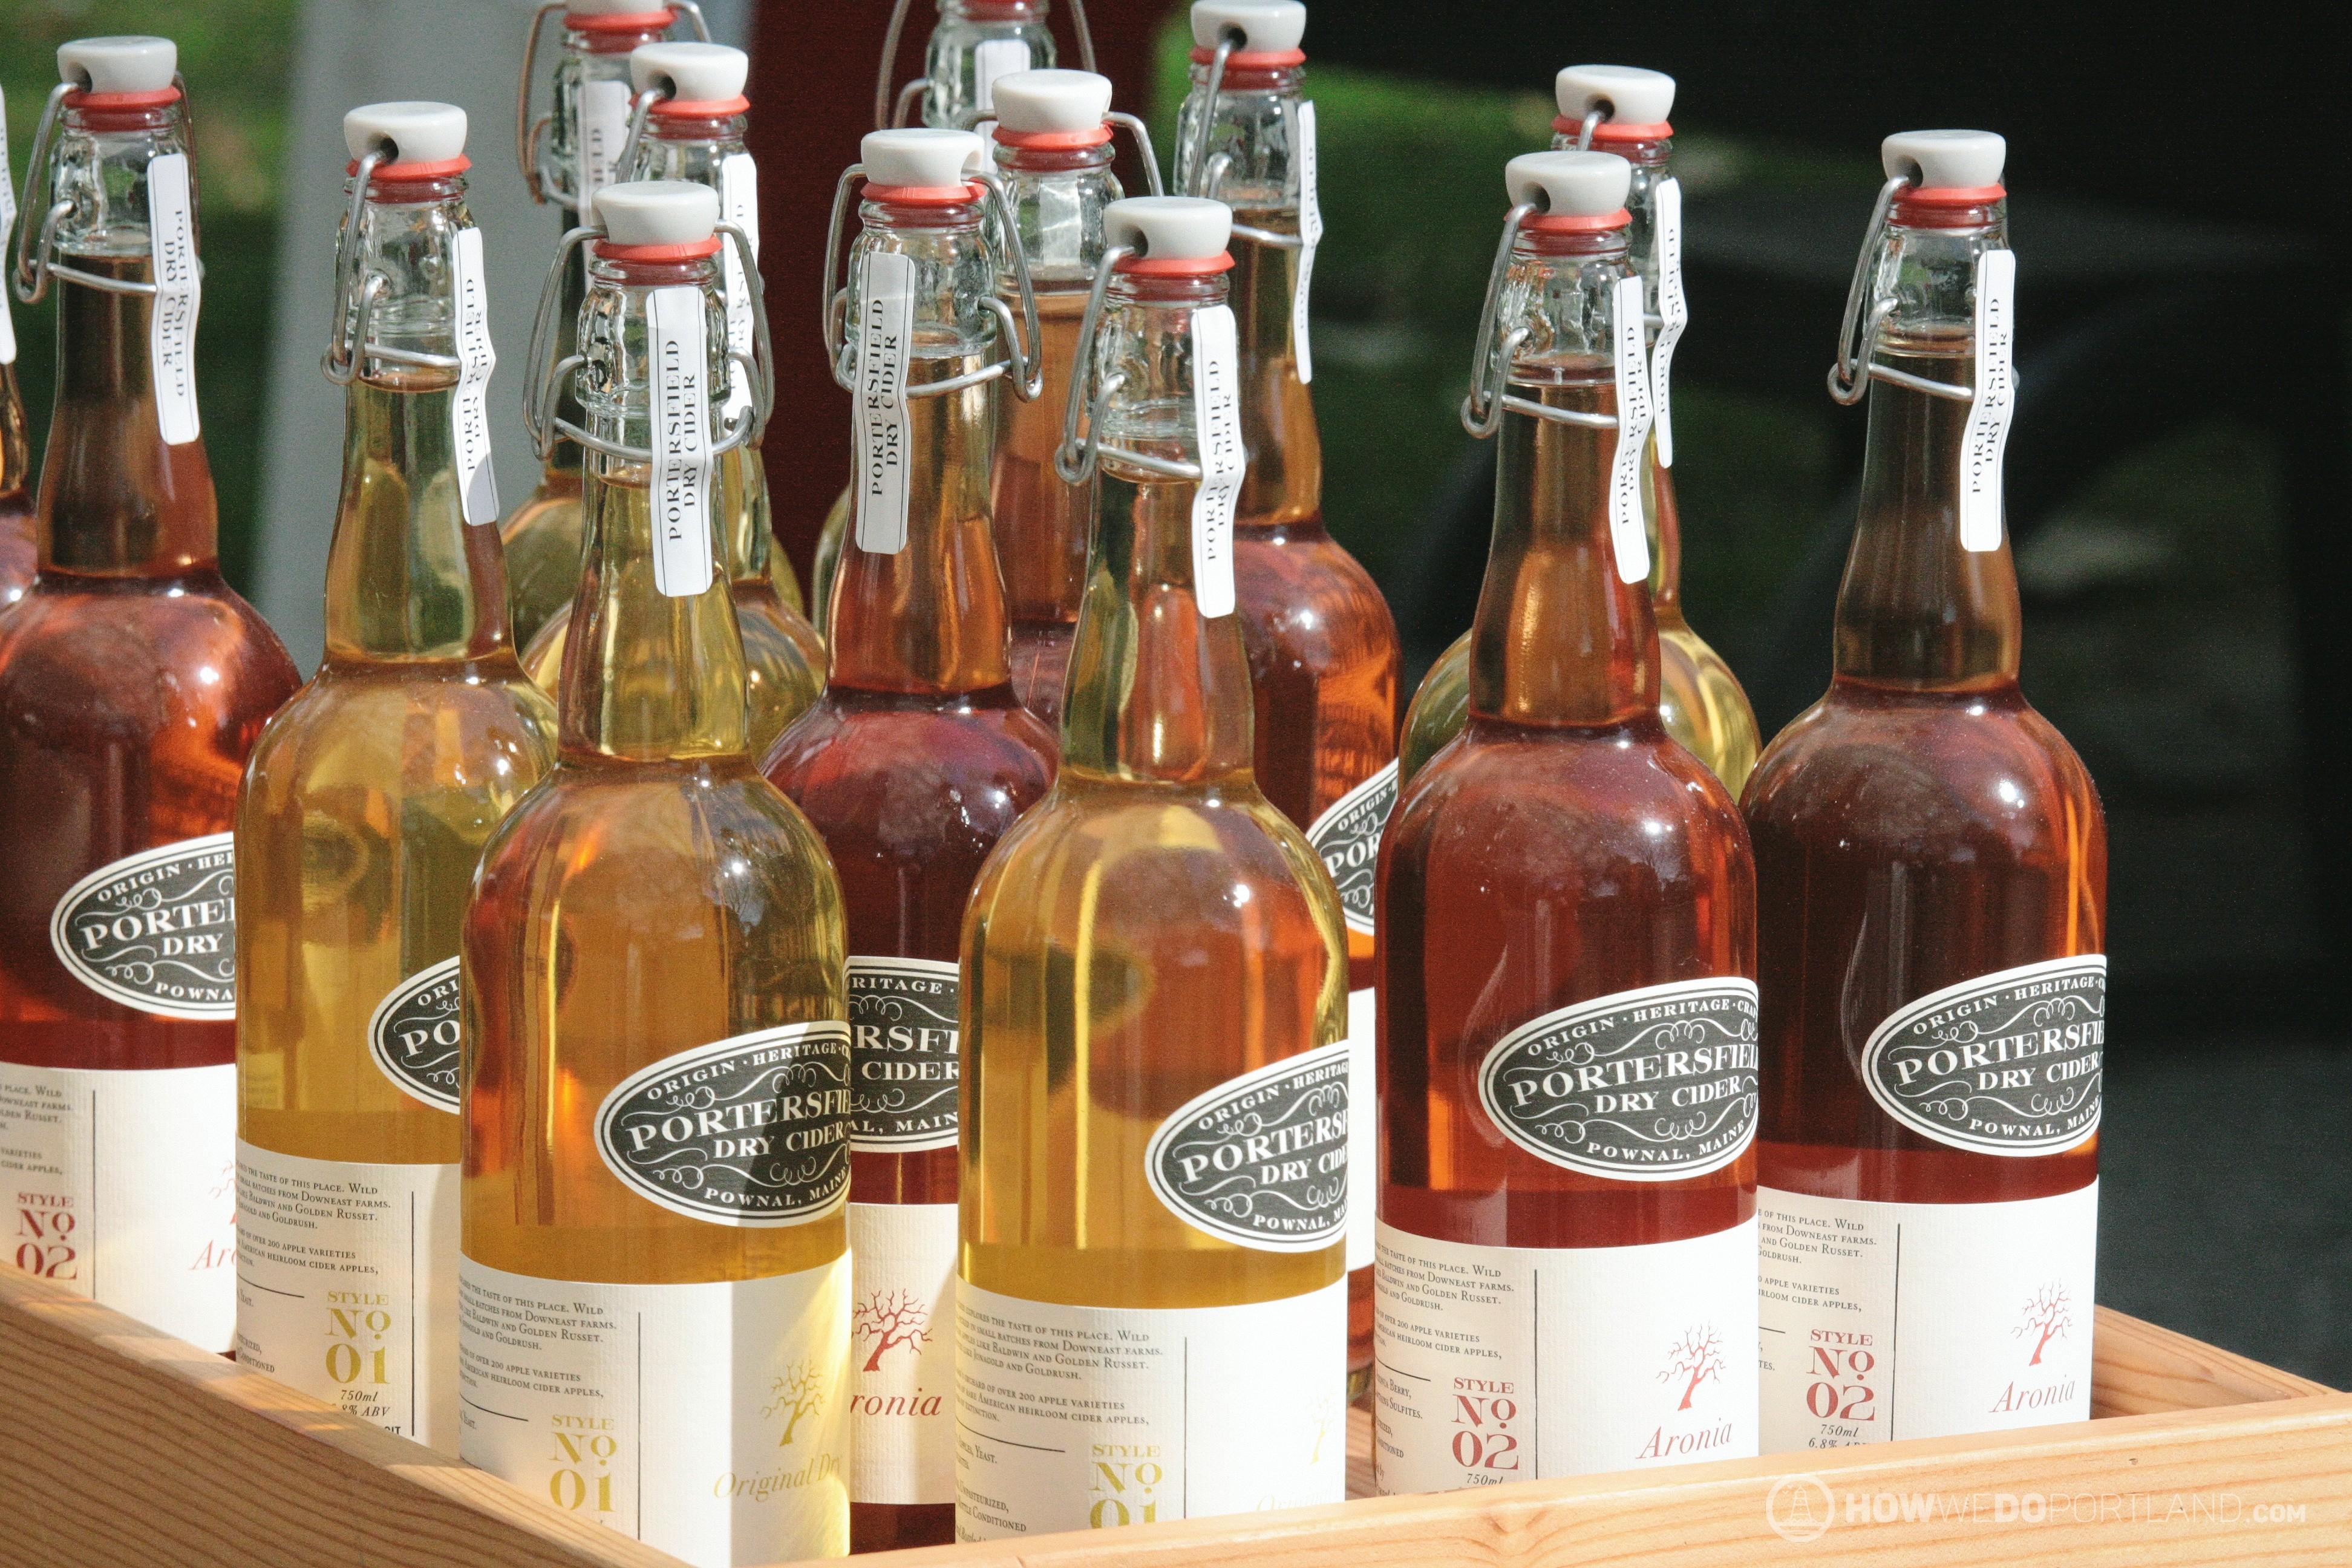 Locally Made Dry Cider